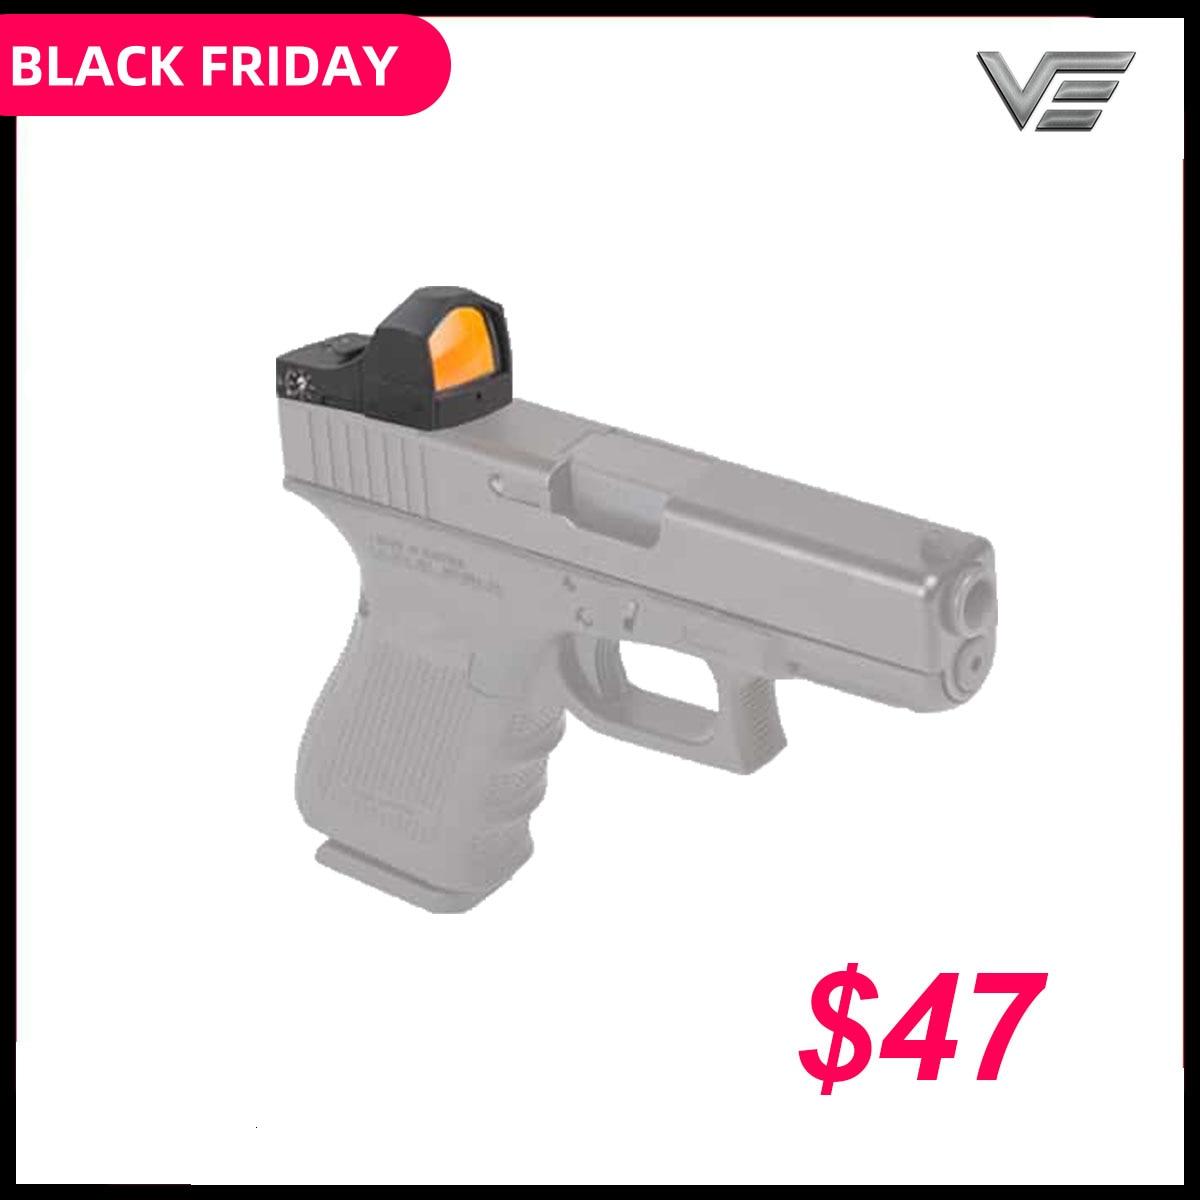 Vector Optics Sphinx 1x22 Auto Brightness Compact Red Dot Sight Doctor 3 MOA 9mm Pistol 12ga Shotgun Reflex Sight